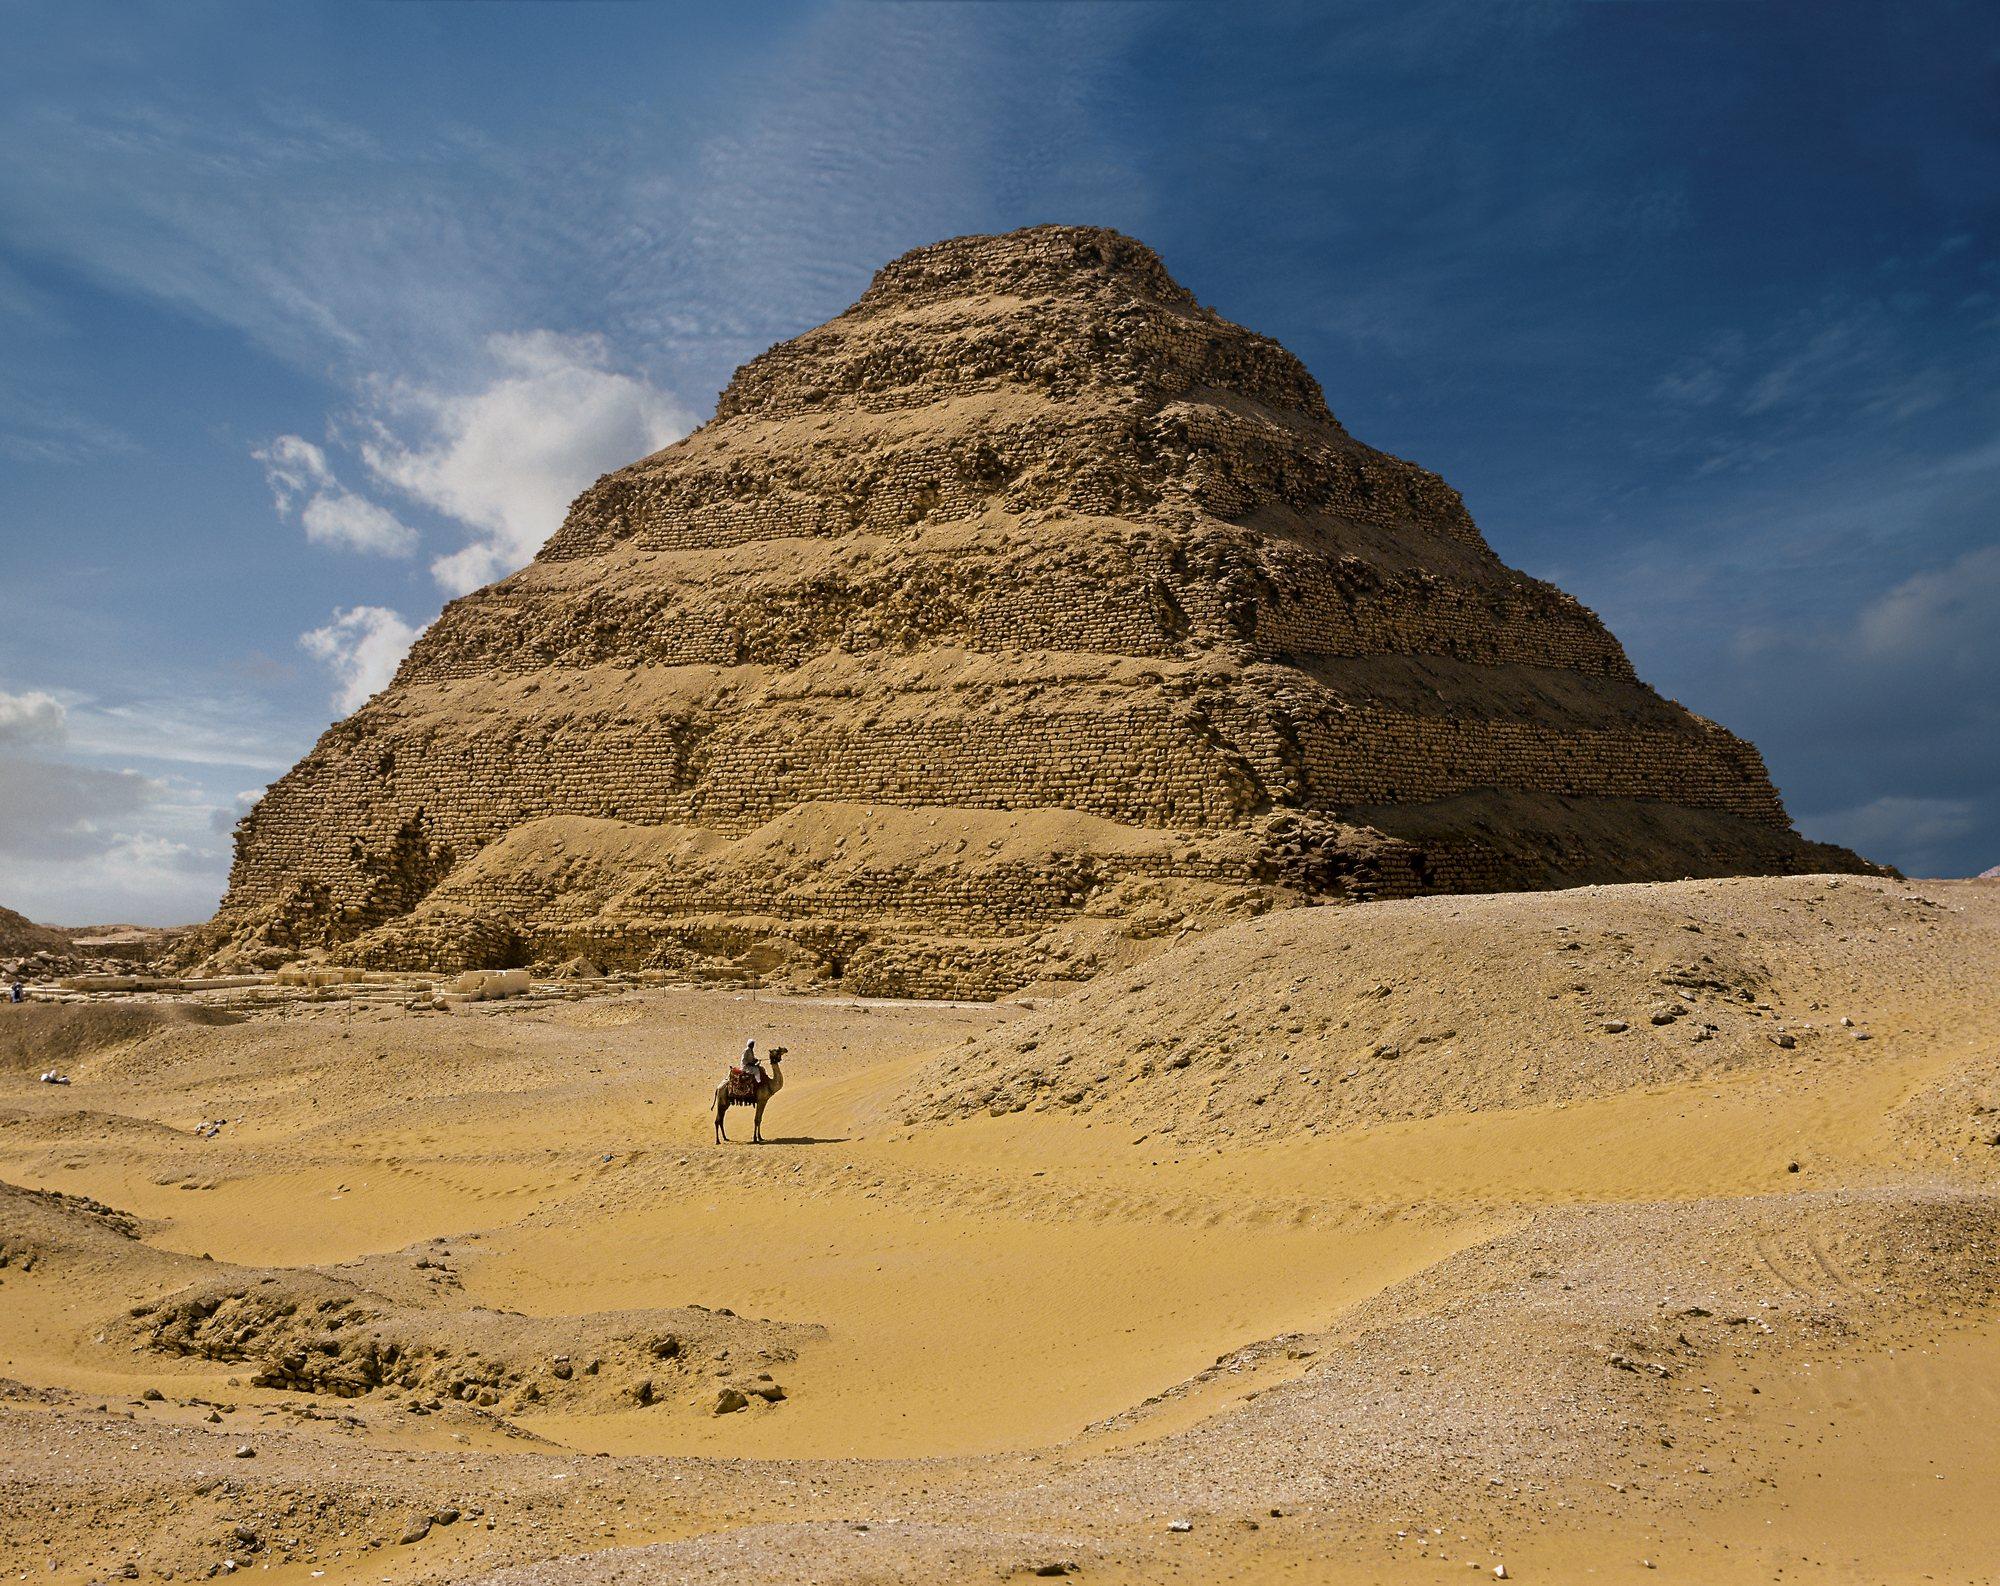 la primera pirámide de la historia